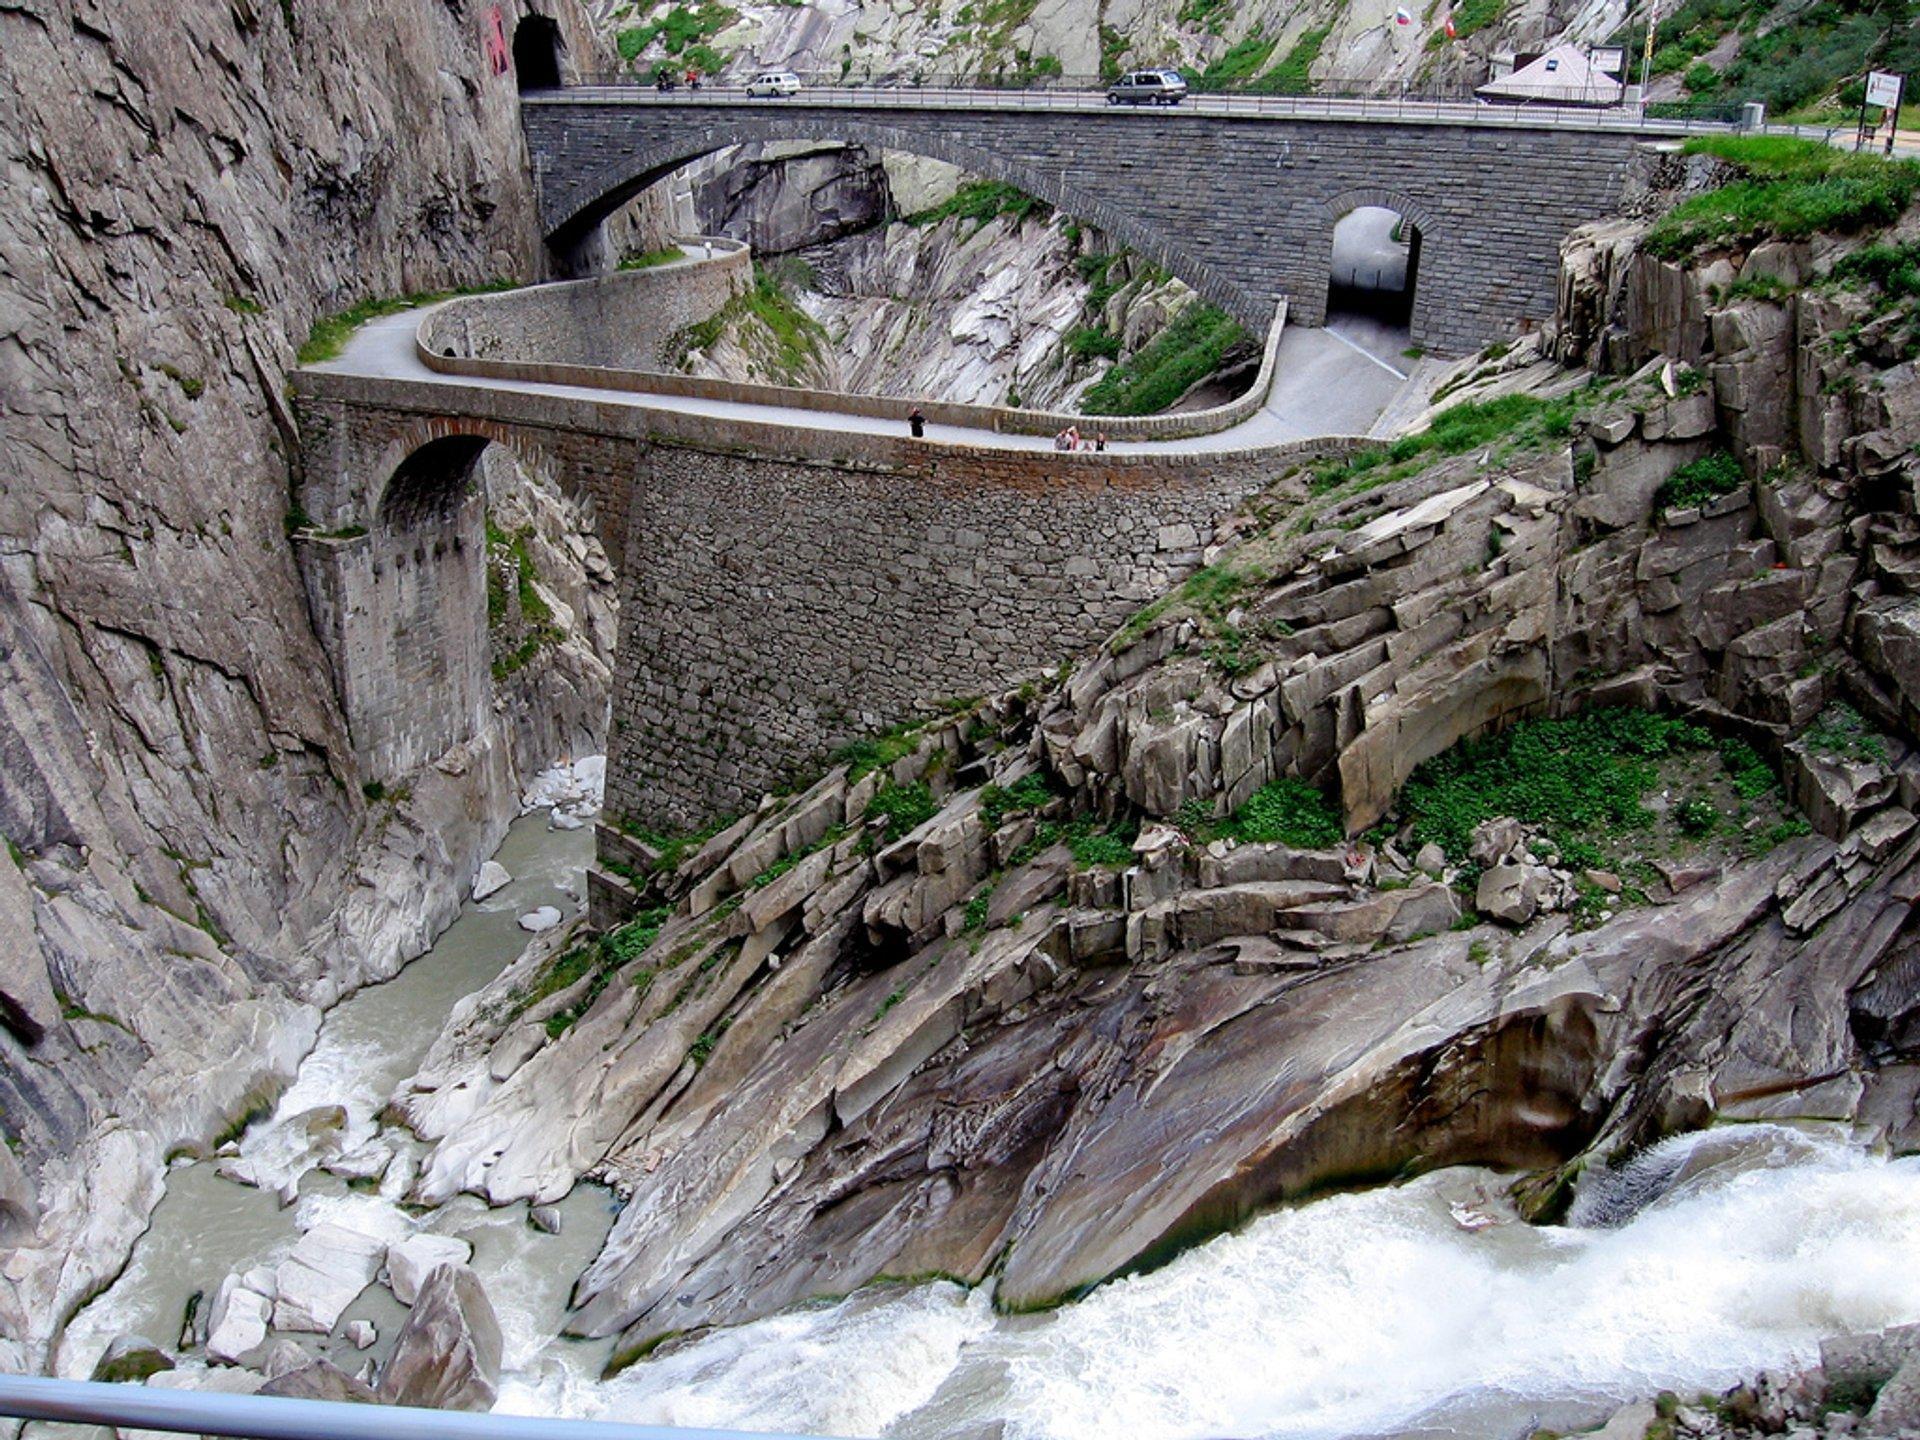 Best time to see Teufelsbrücke or Devil's Bridge in Switzerland 2020